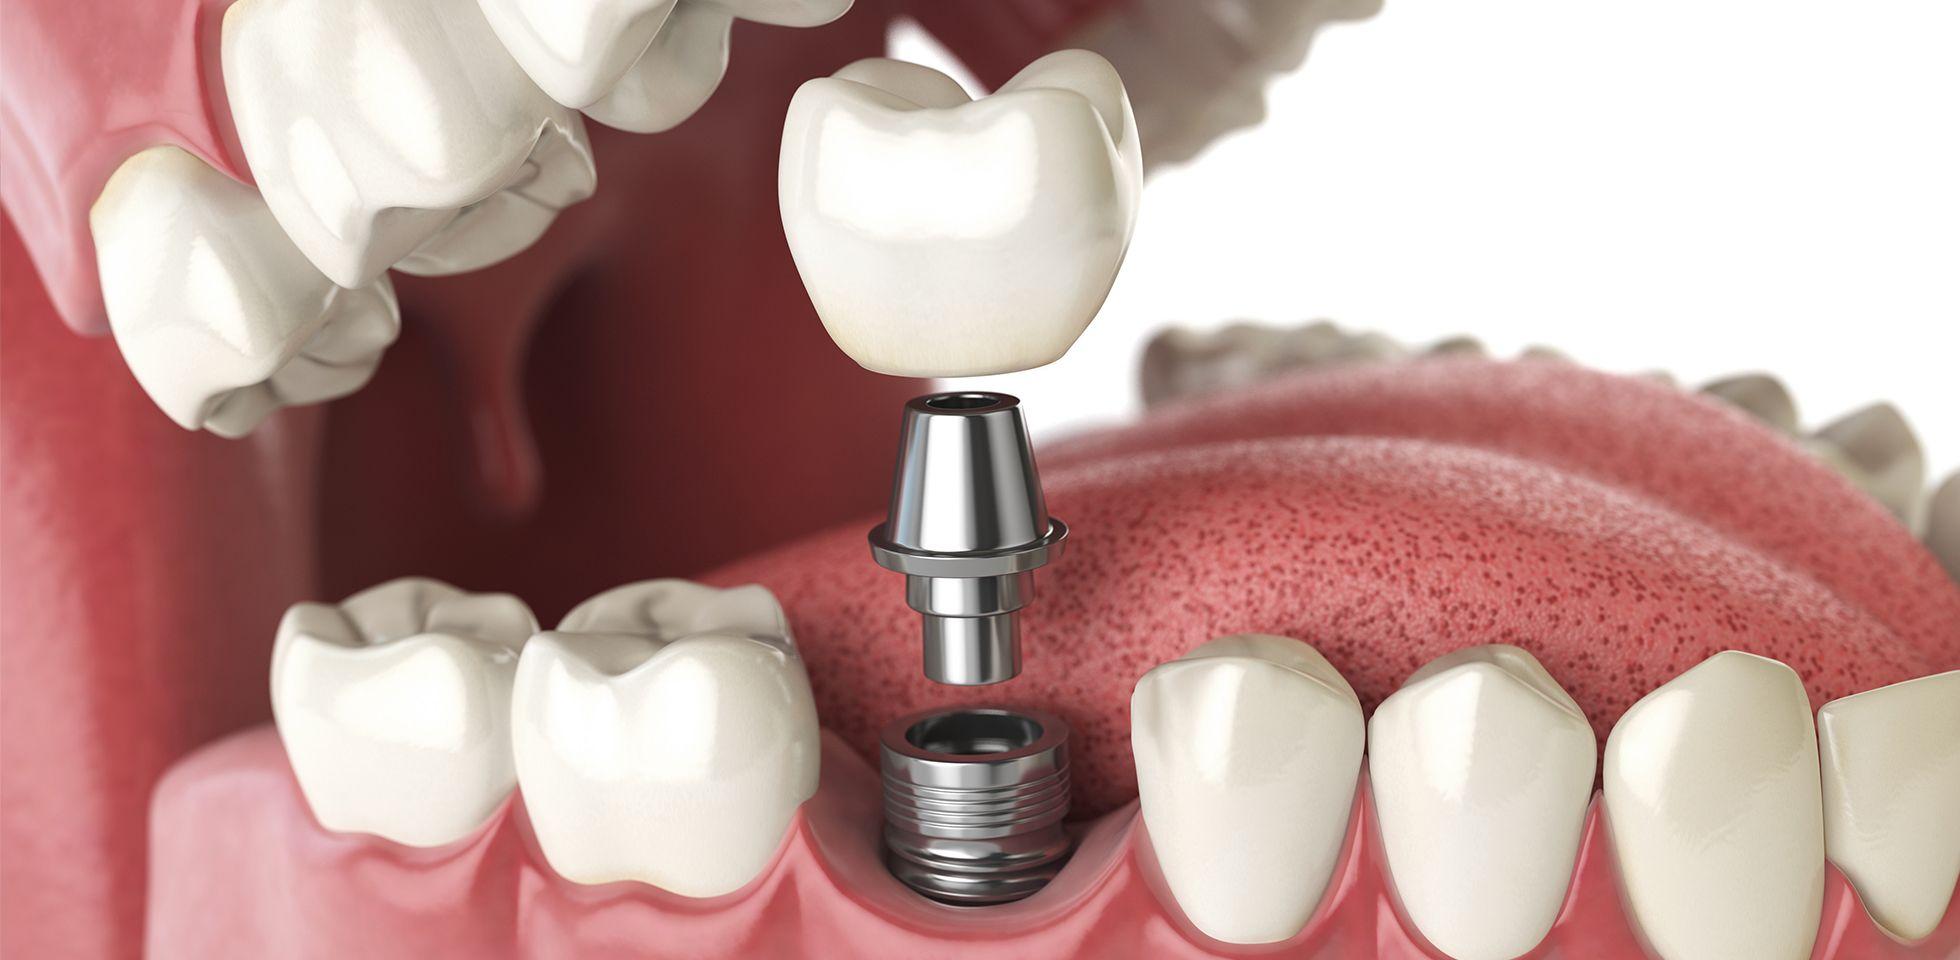 Why should I visit the dentist regularly?